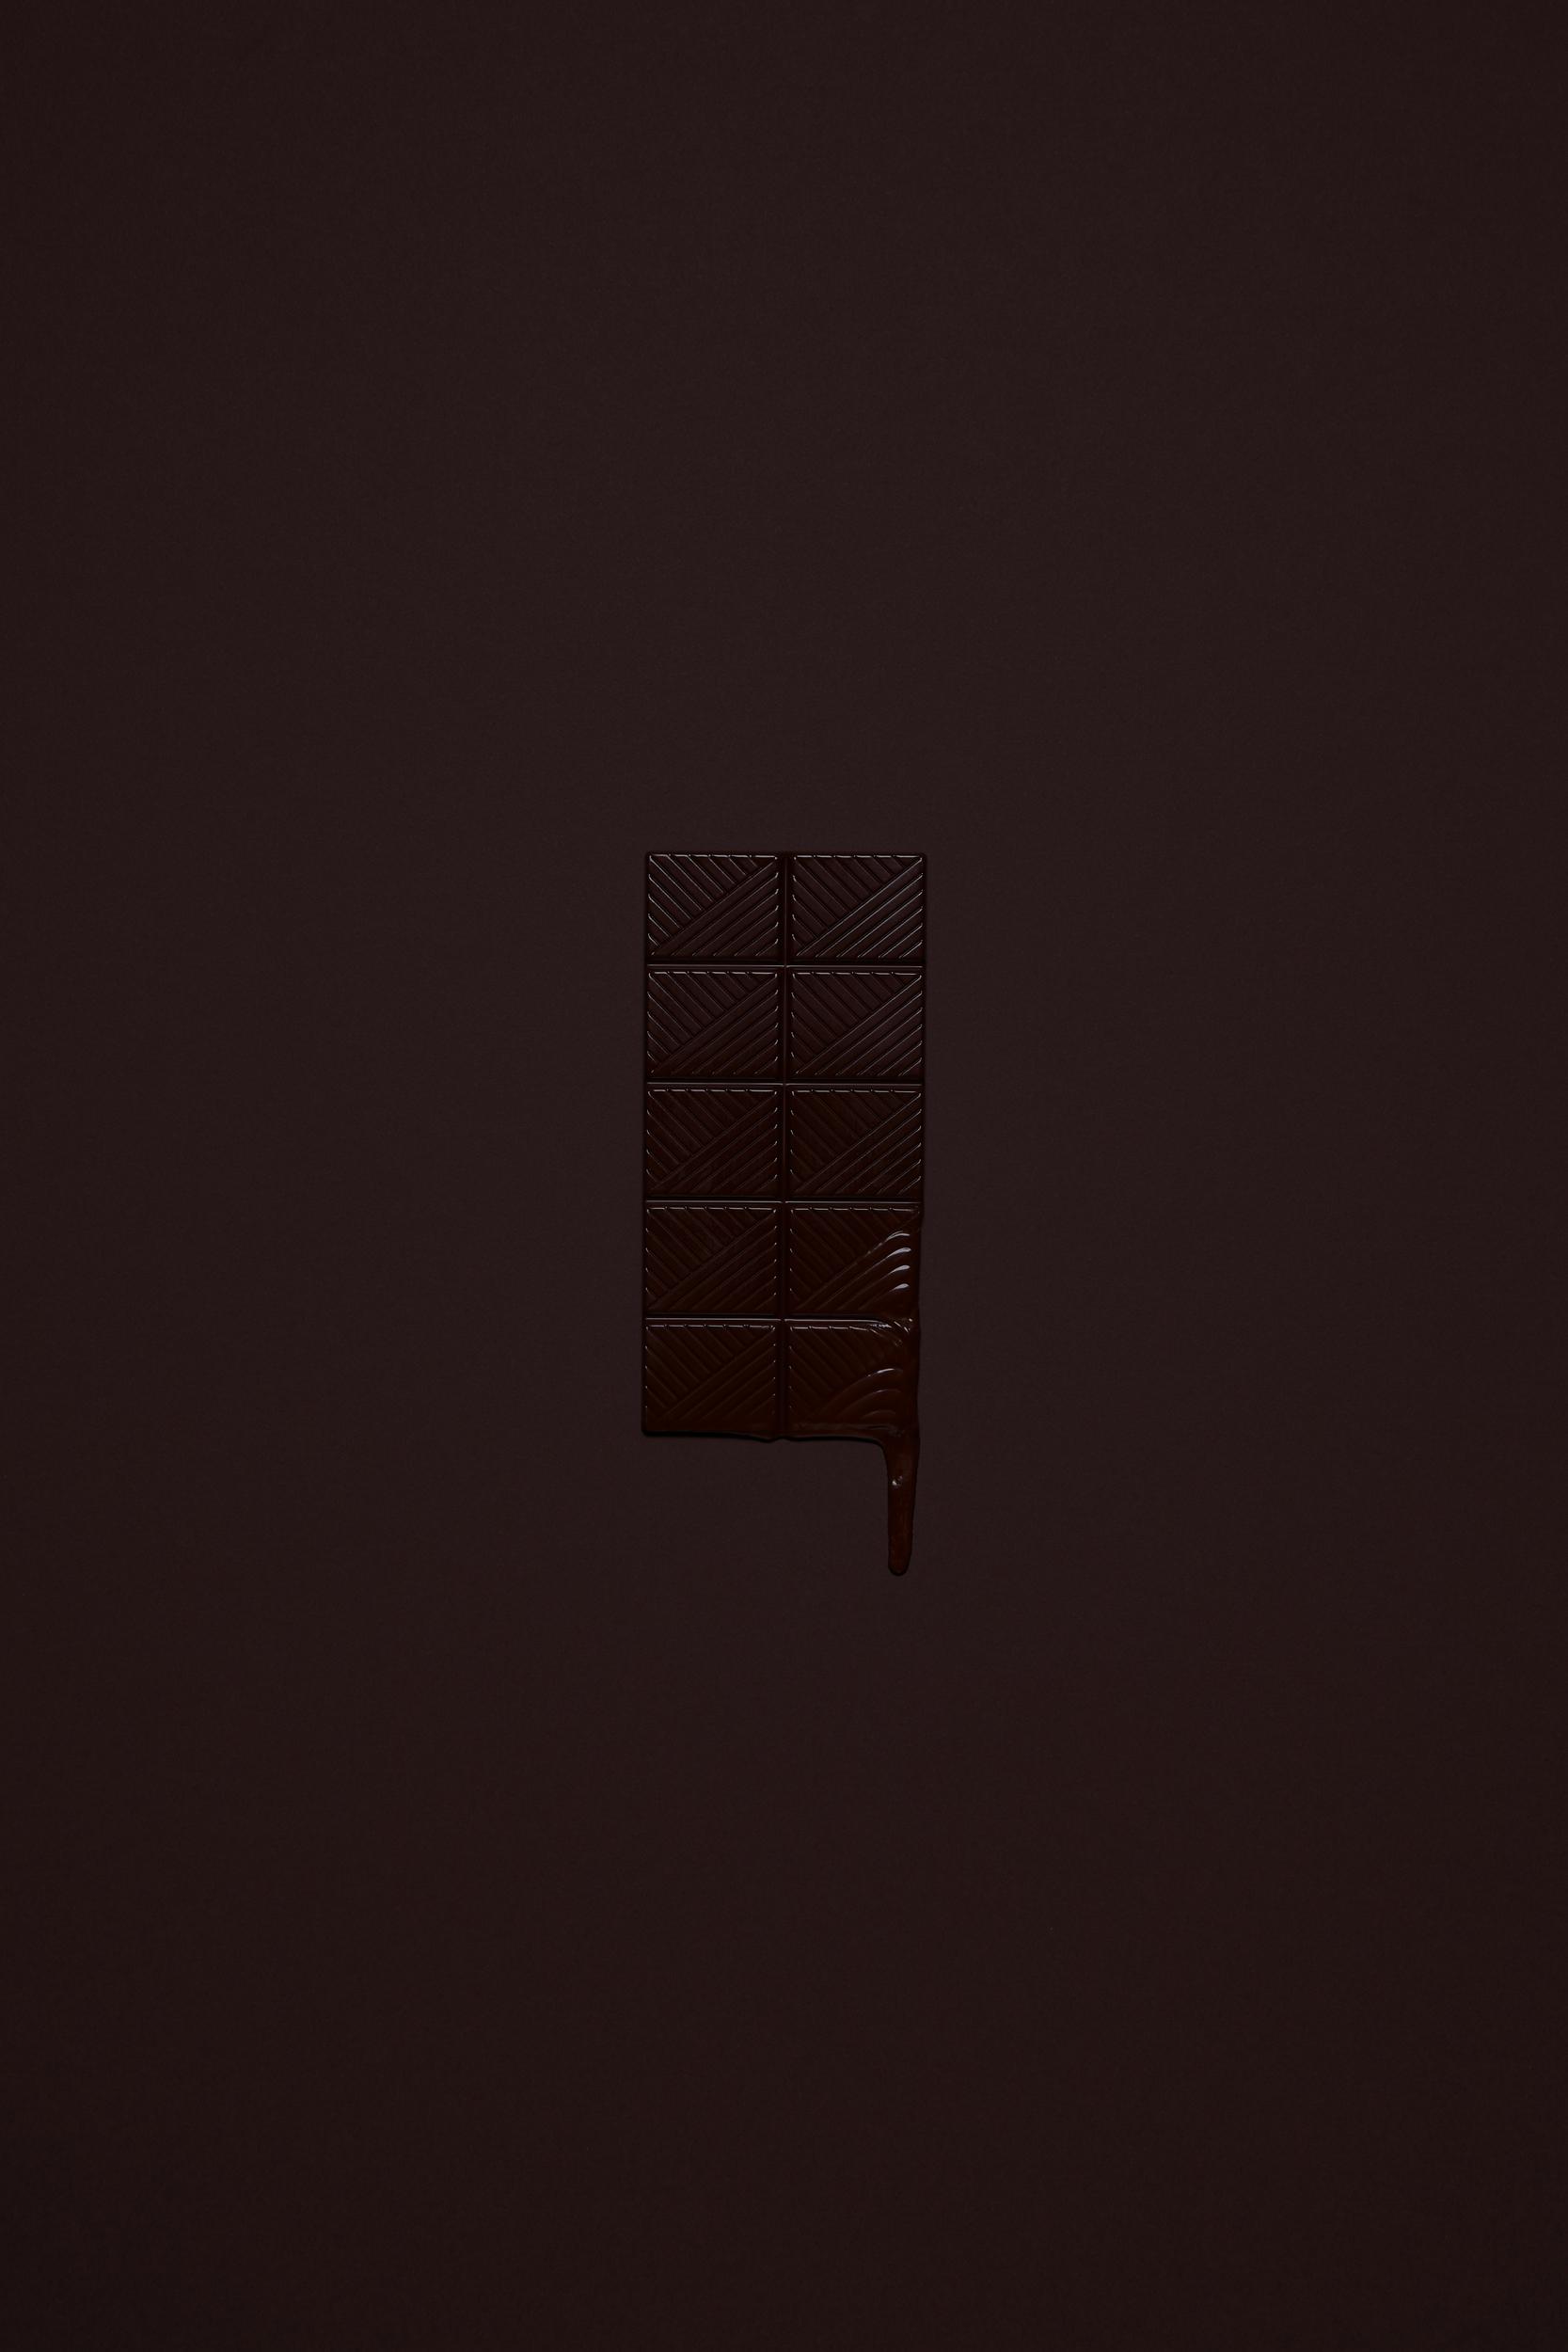 ColorPlan_Bitter_Chocolade_2.jpg